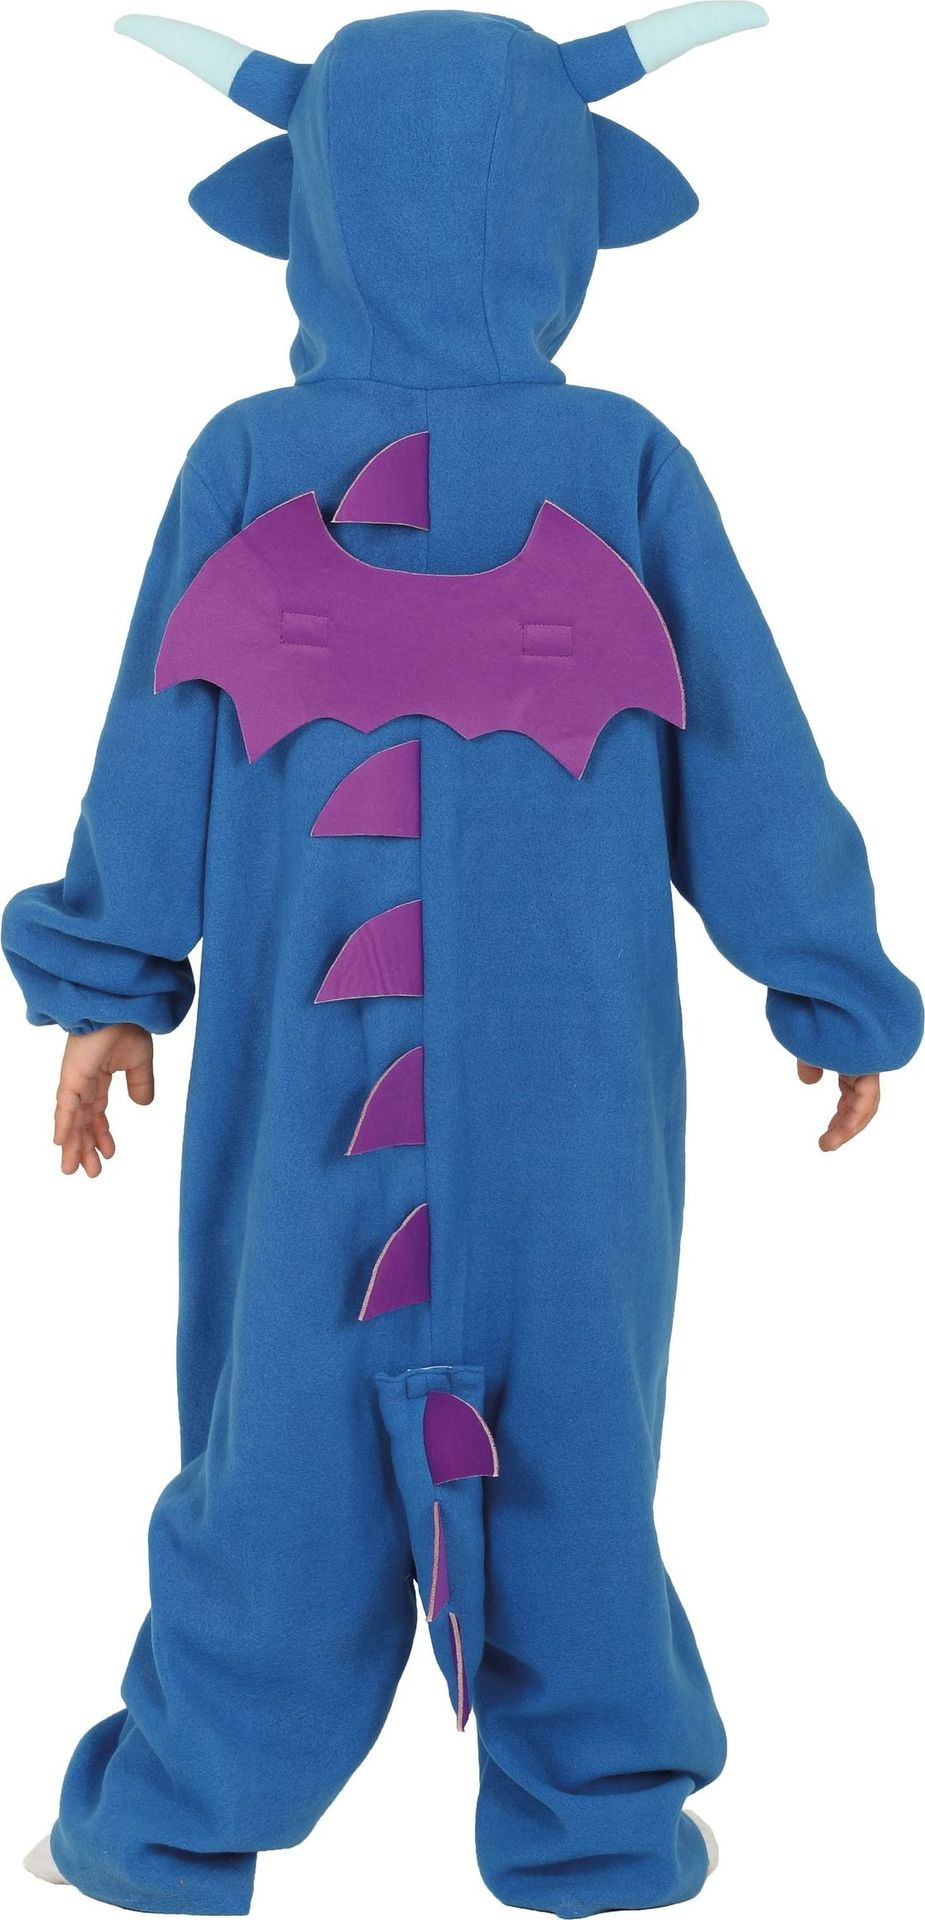 Blauwe draak kind kostuum